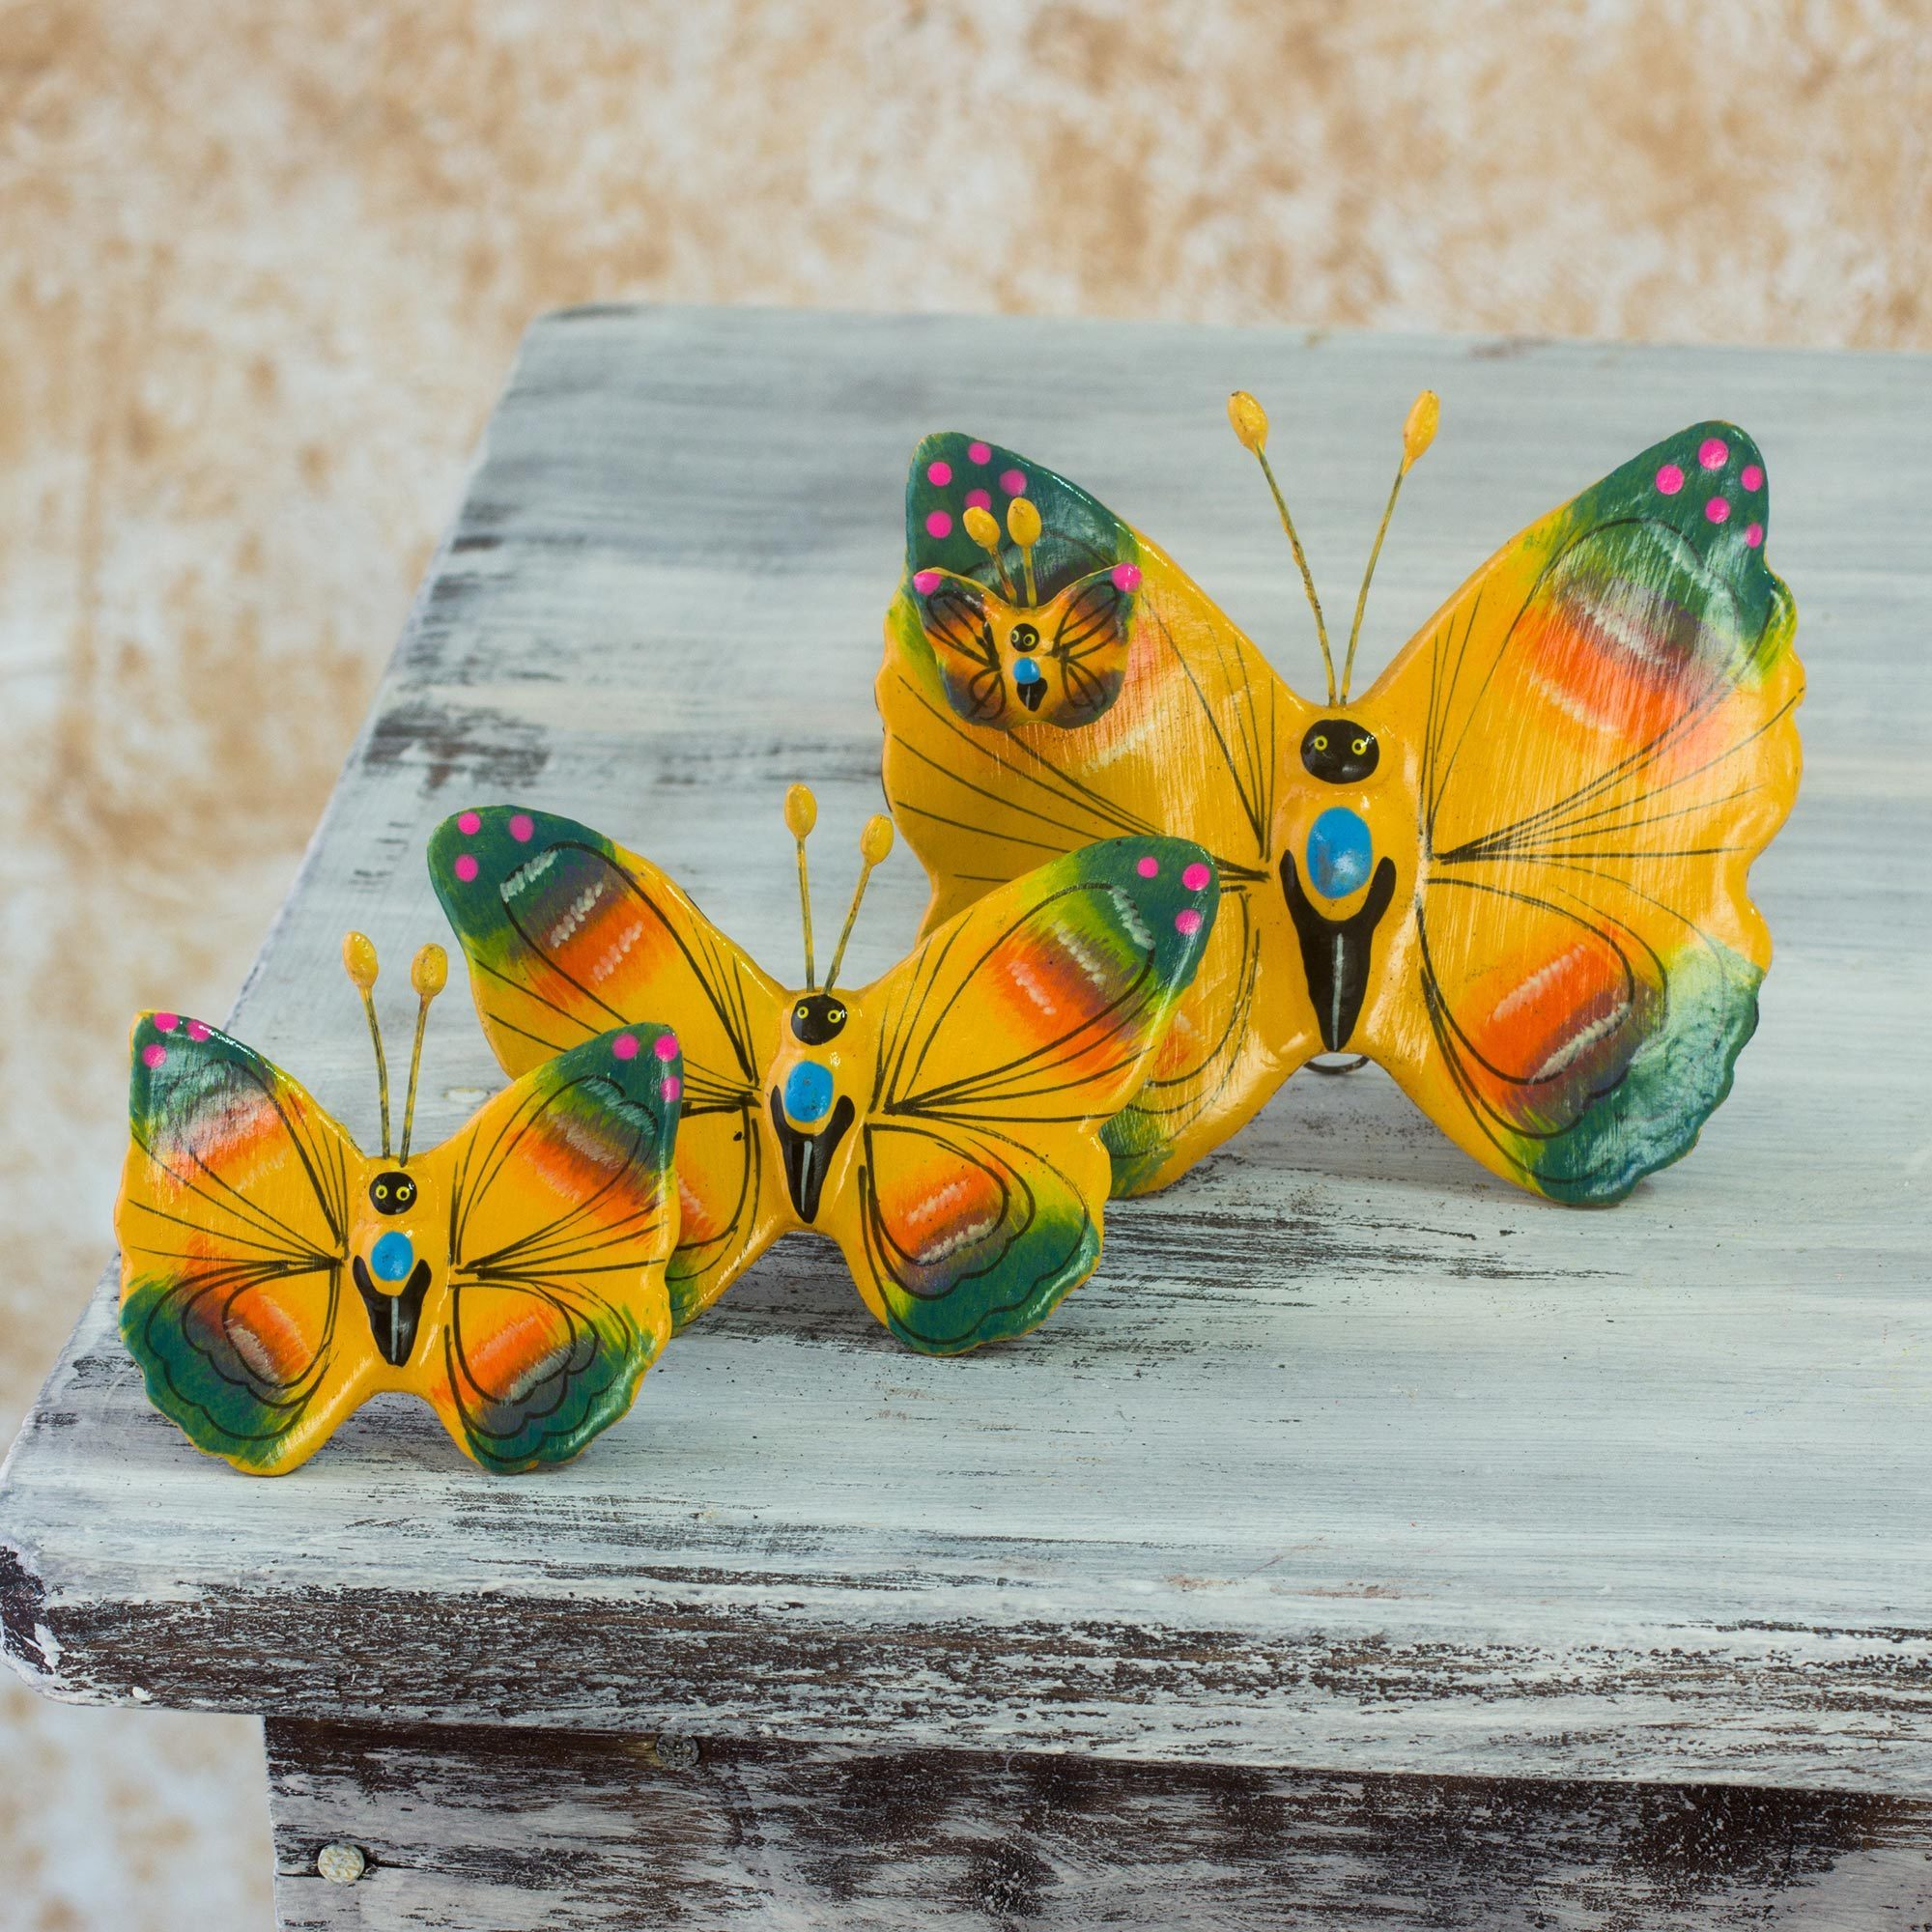 Handmade Set of 3 Ceramic \'Totonicapan Butterflies\' Sculptures ...